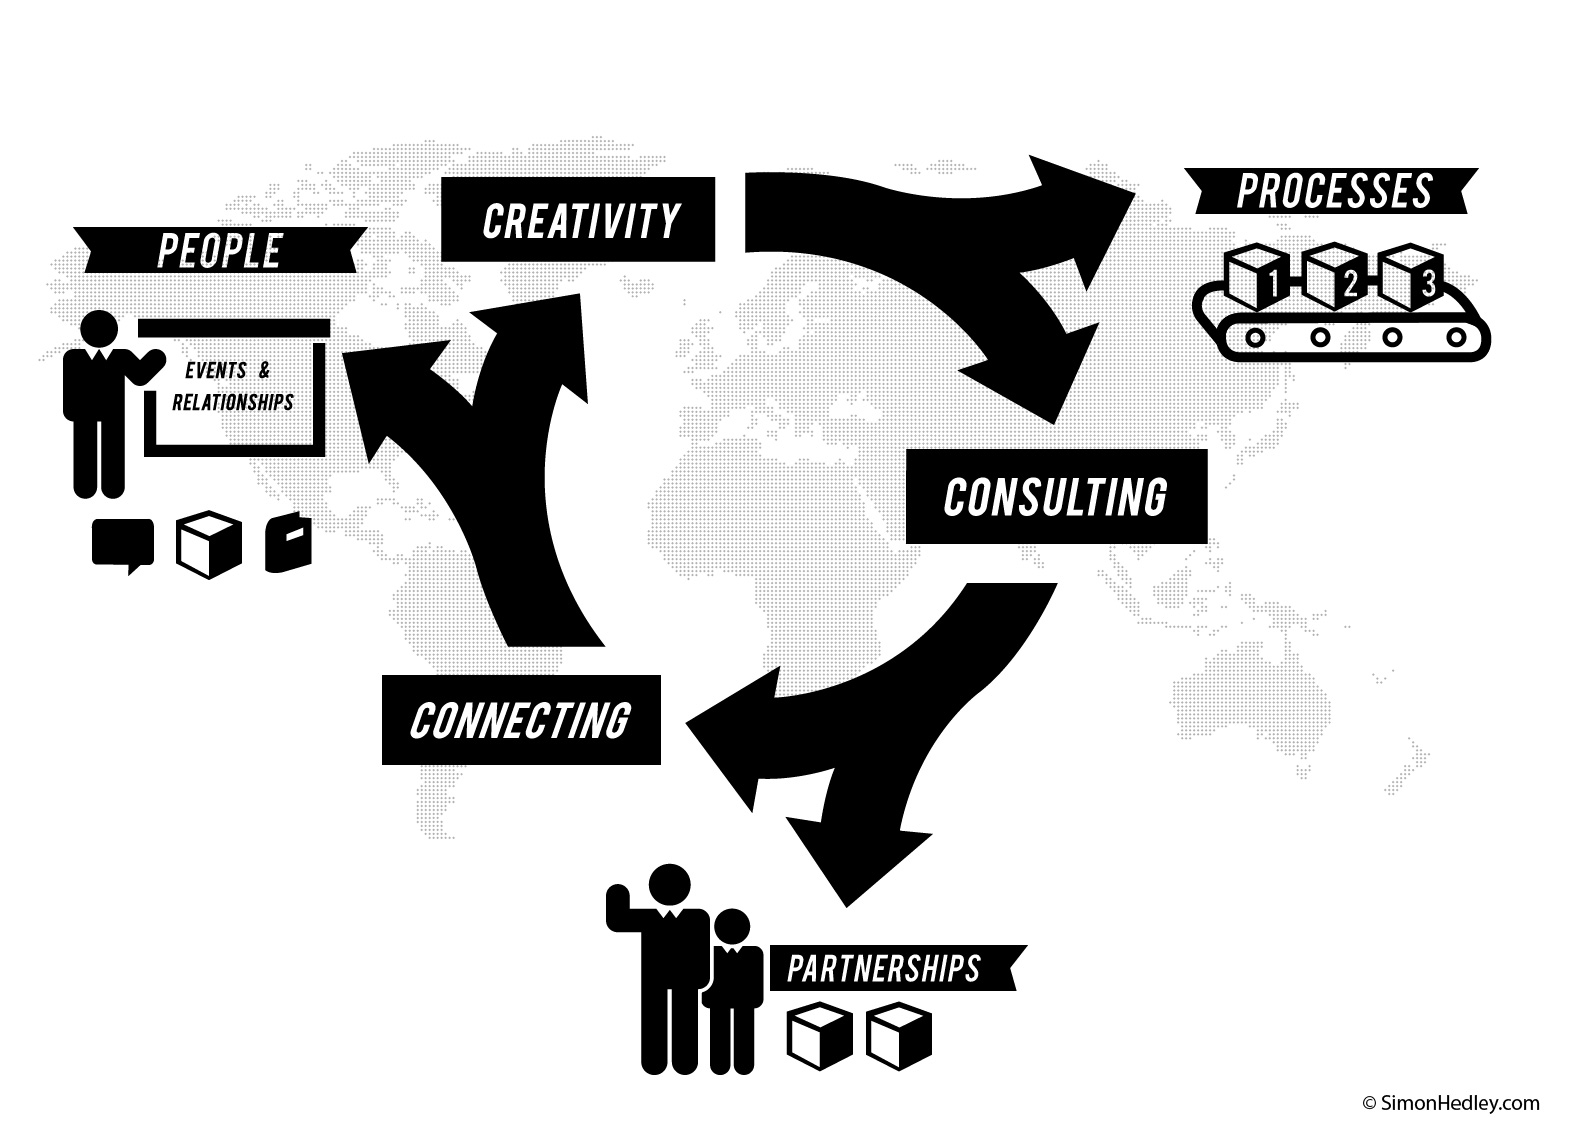 How I create graphic